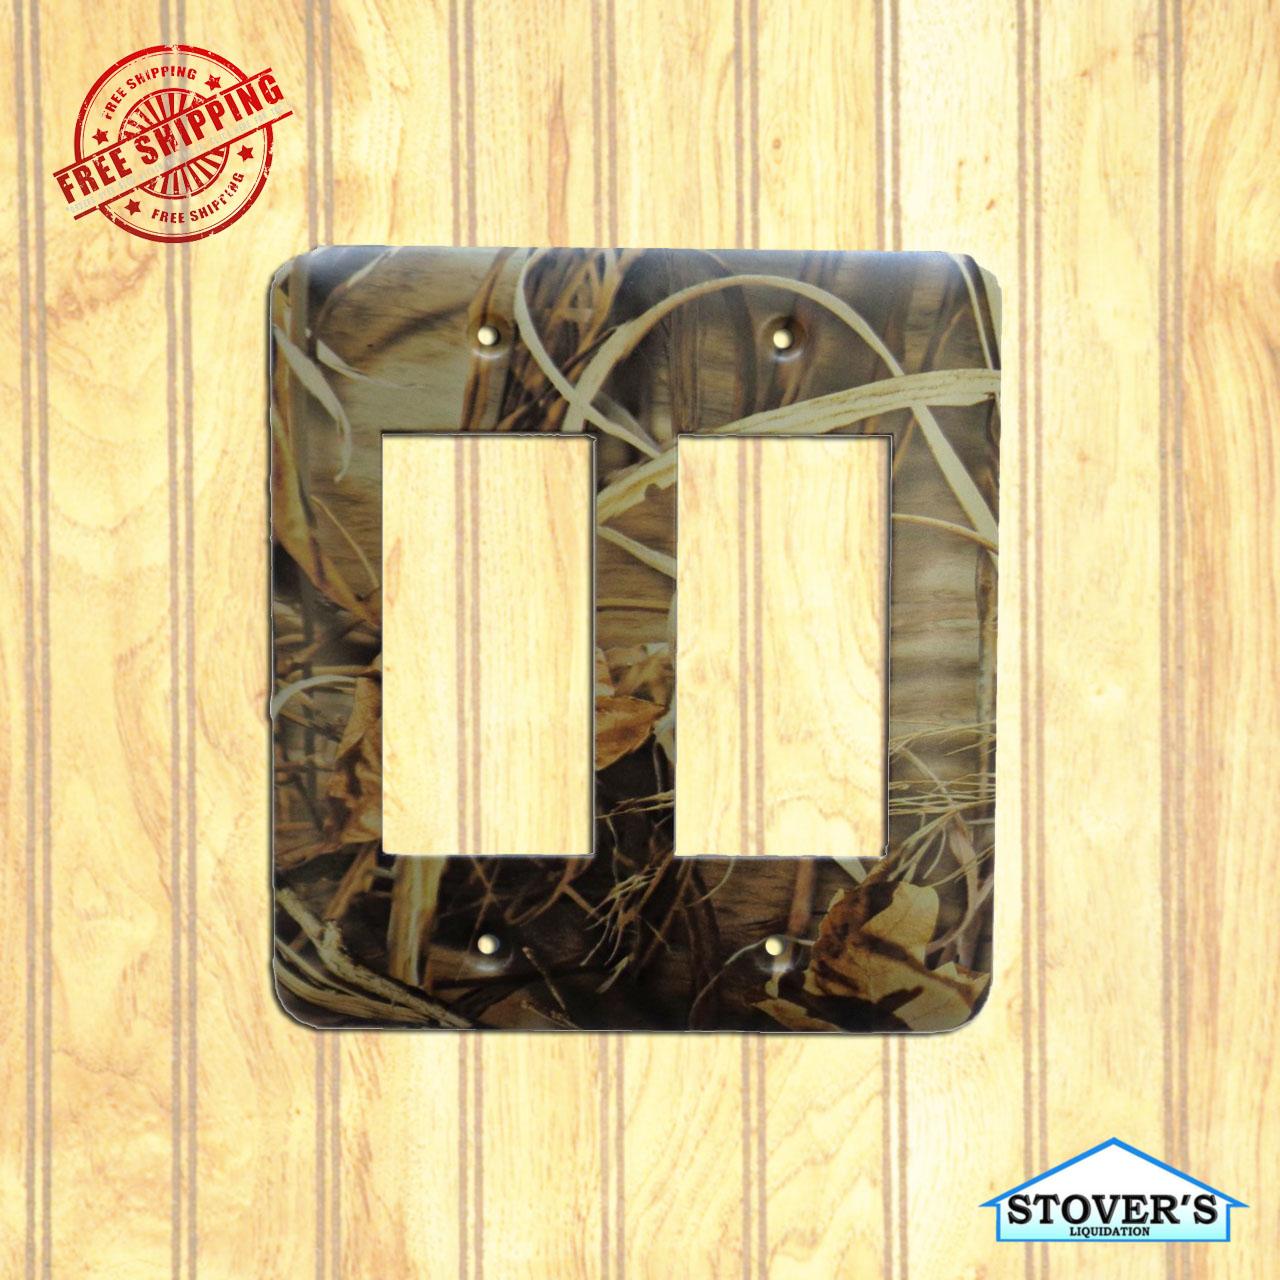 63162-double-rocker-light-switch-plate-outdoors-camo-advantage-max-4-stovers-liquidation.jpg